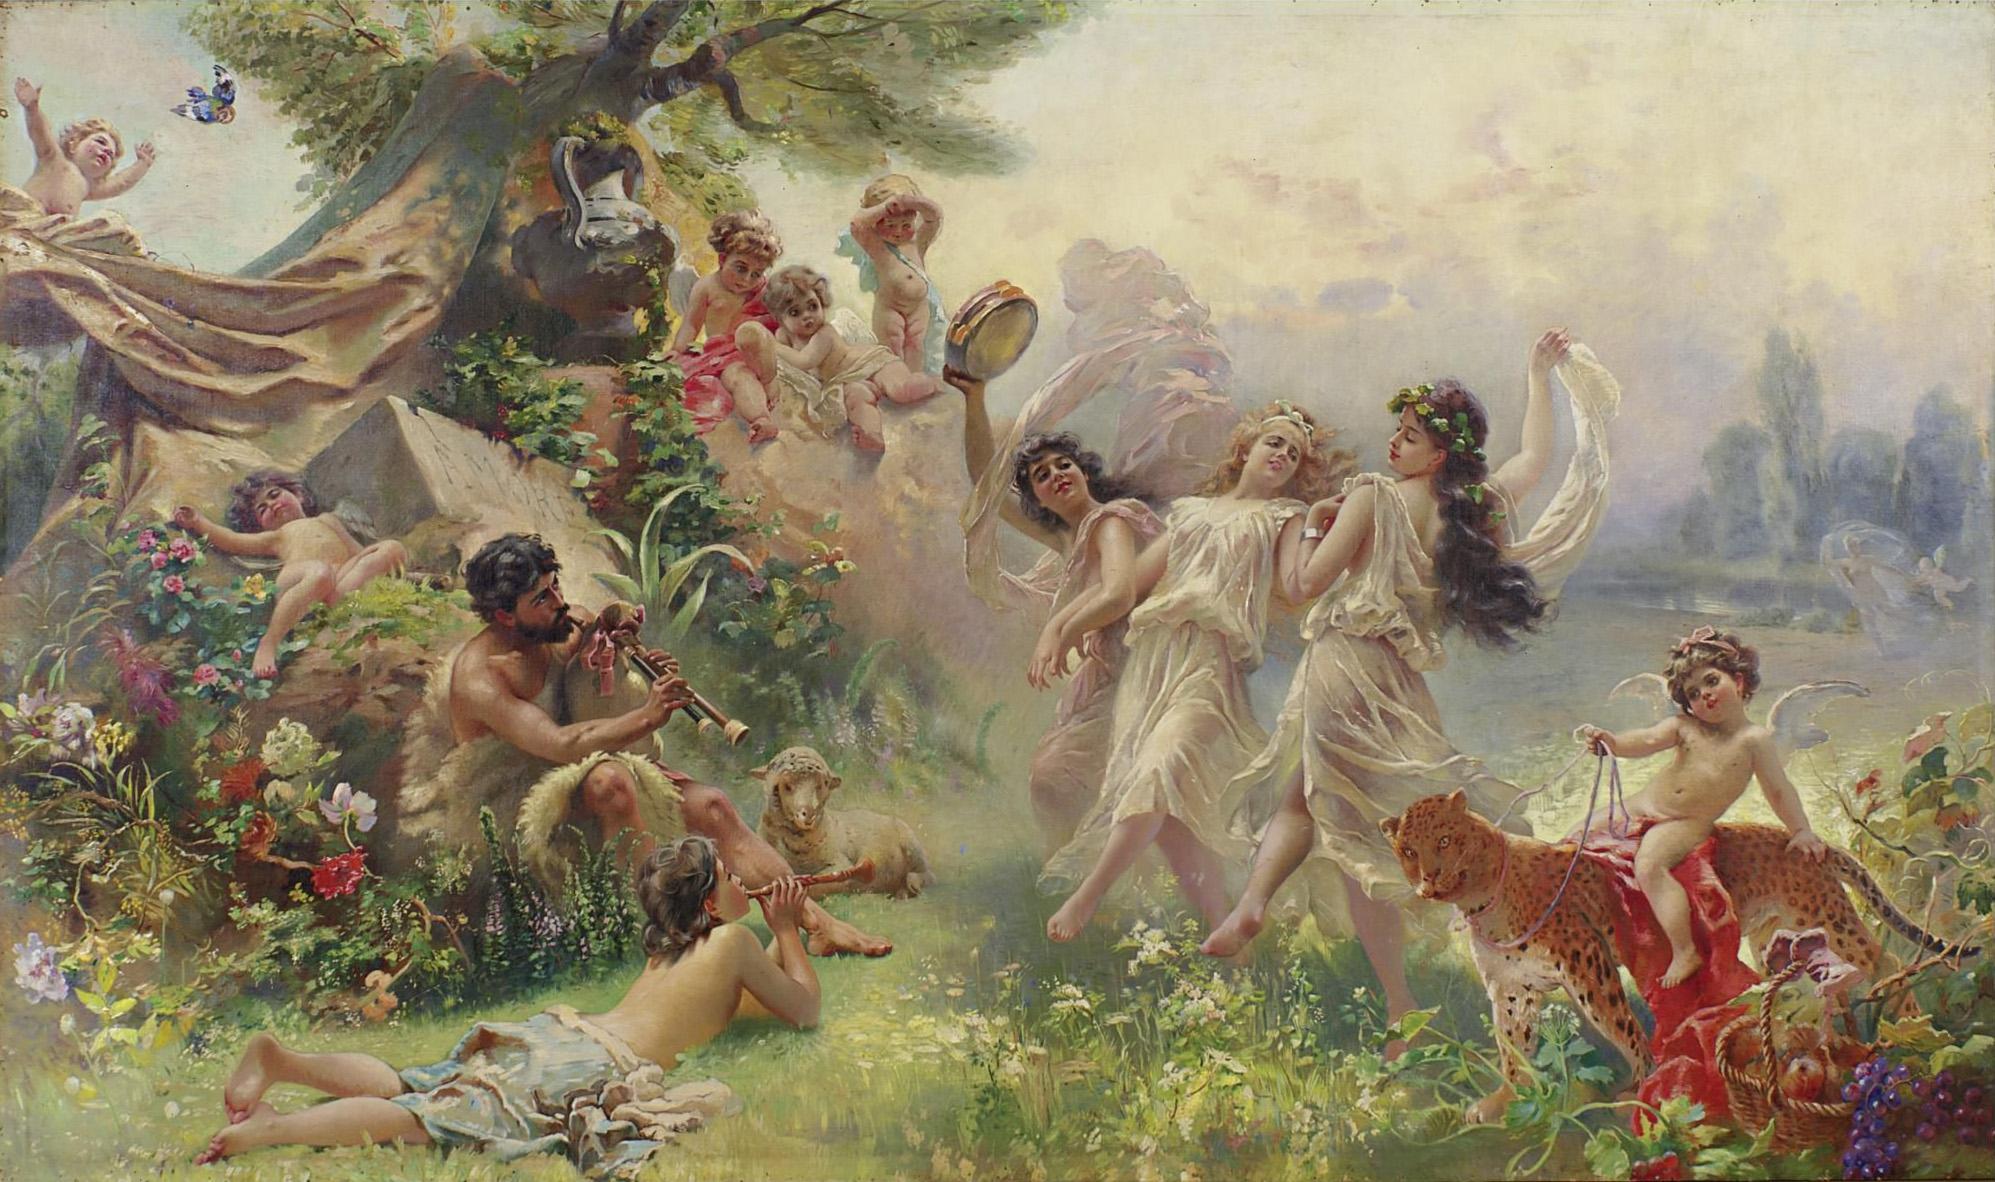 http://uploads8.wikipaintings.org/images/konstantin-makovsky/happy-arcadia-1890.jpg